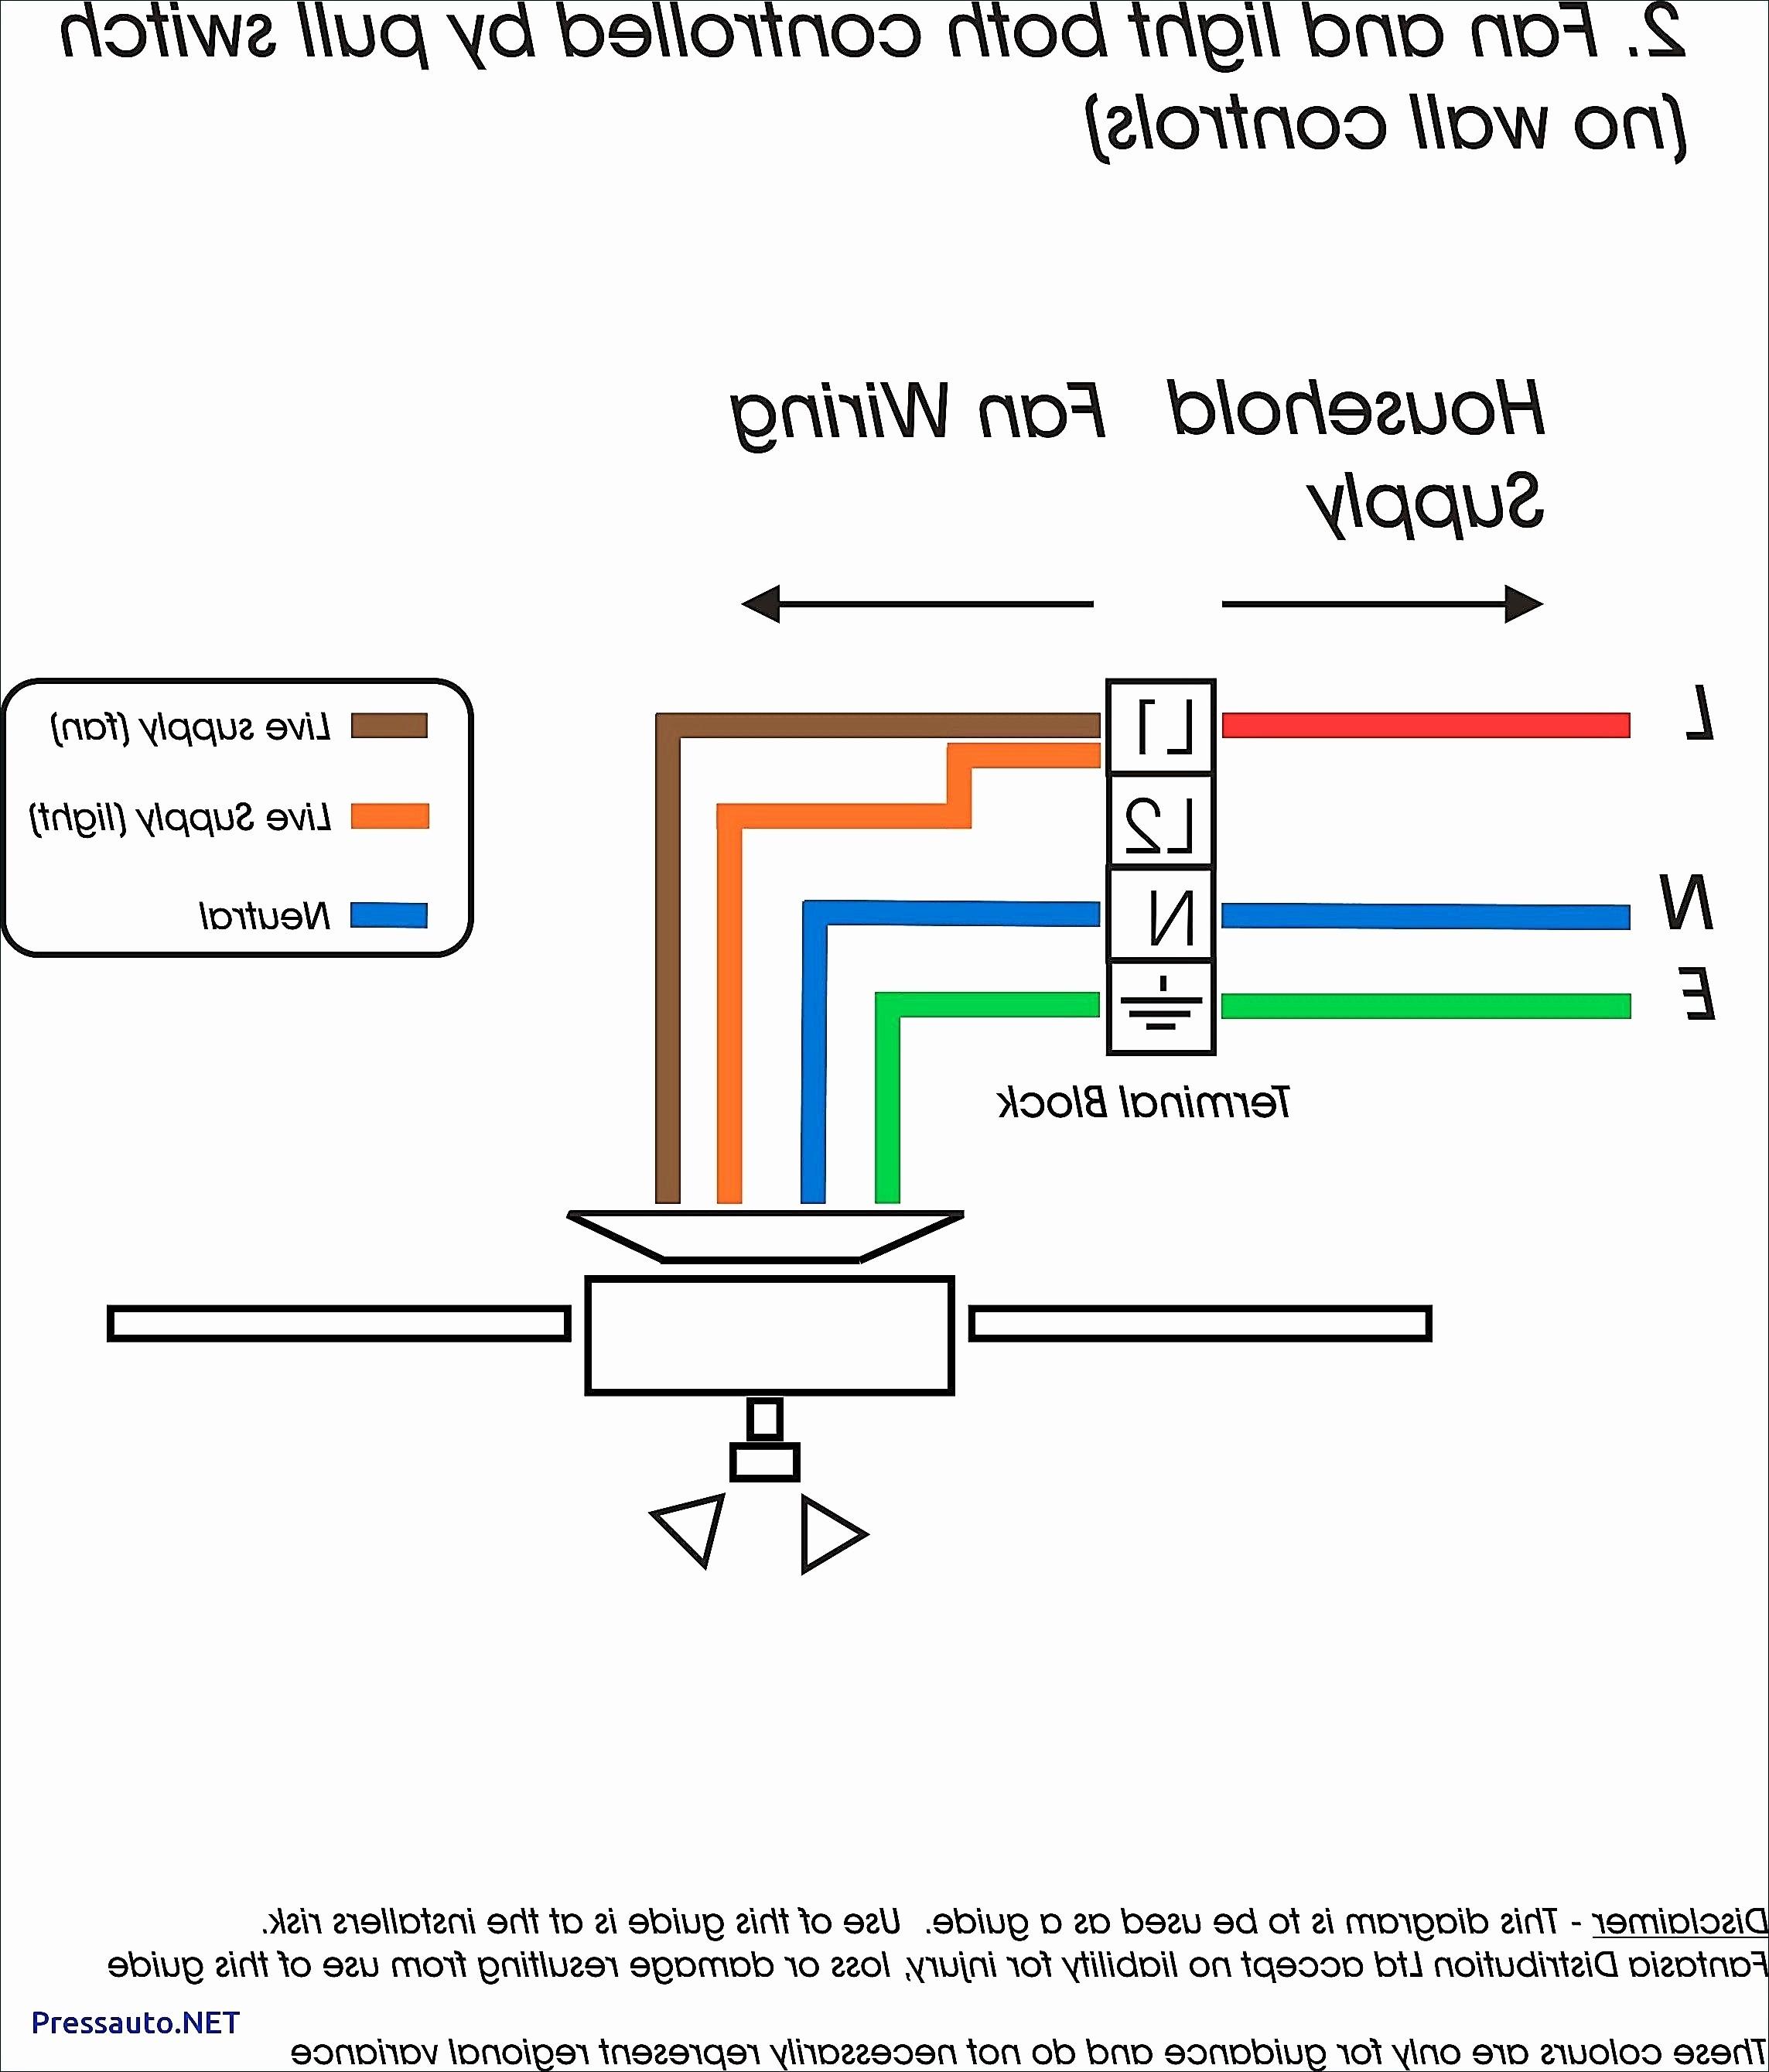 Jeep 4 0 Engine Diagram 2 26 Jeep 4 0 Engine Diagram – Simple Wiring Diagram Of Jeep 4 0 Engine Diagram 2